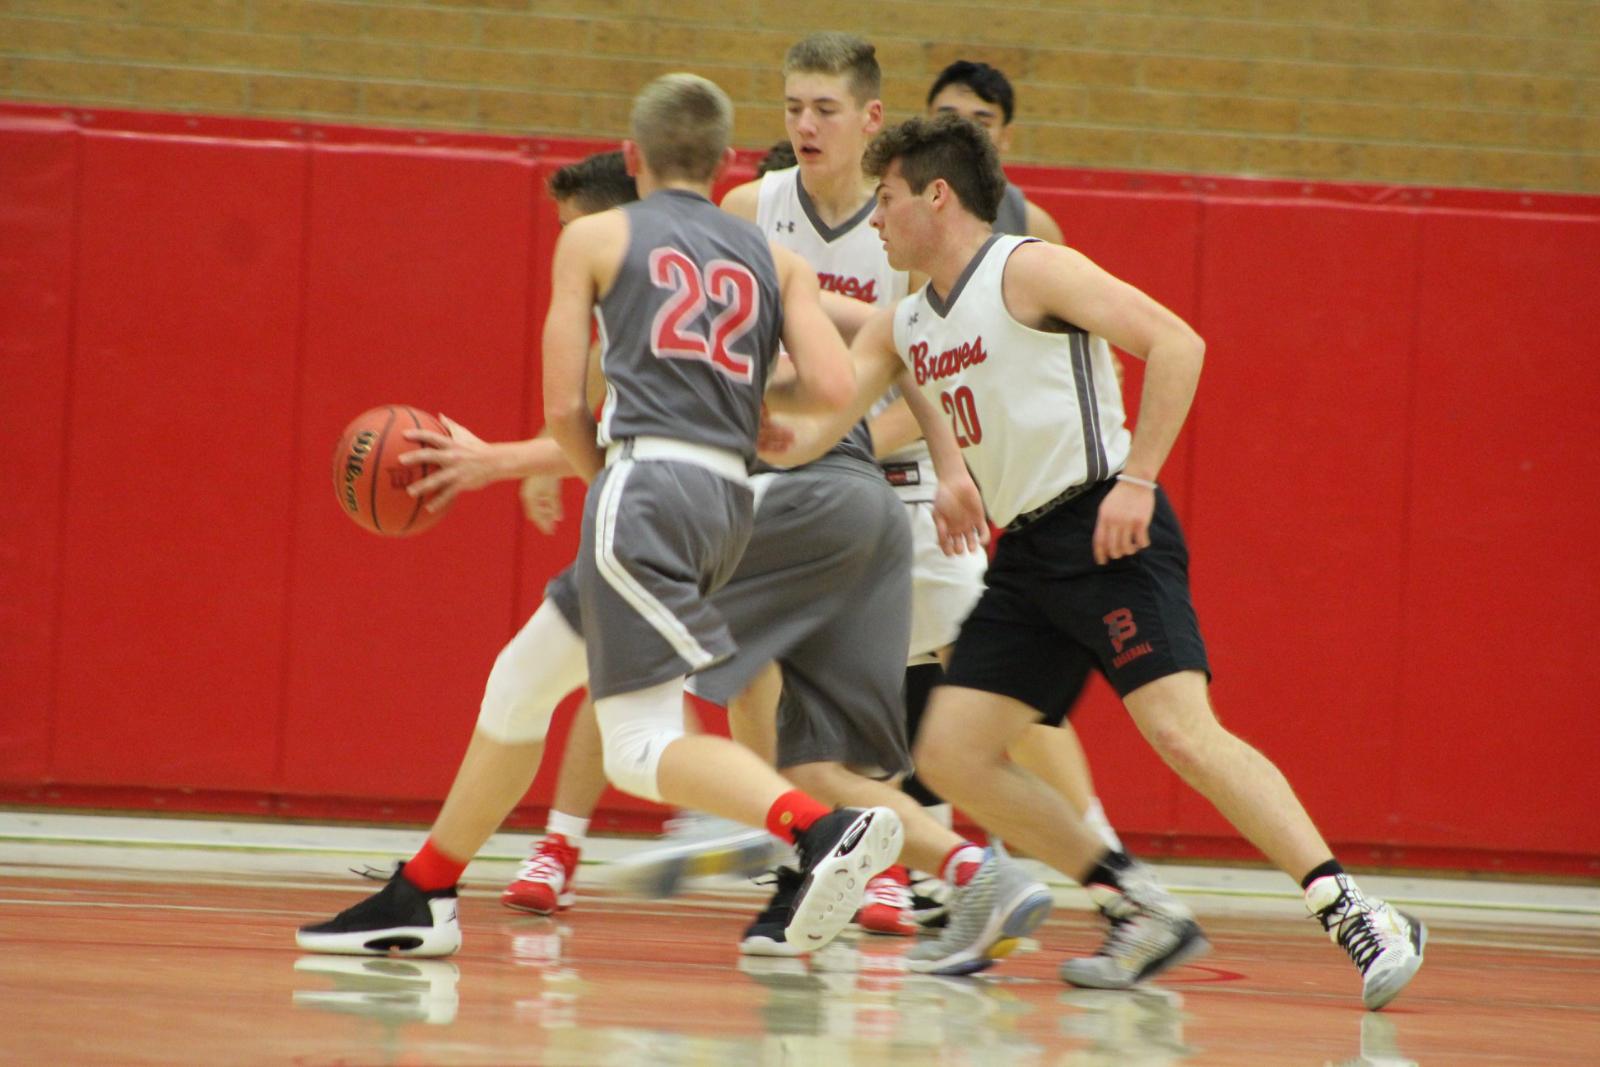 Boys Basketball Opens Season with Old Rival Davis